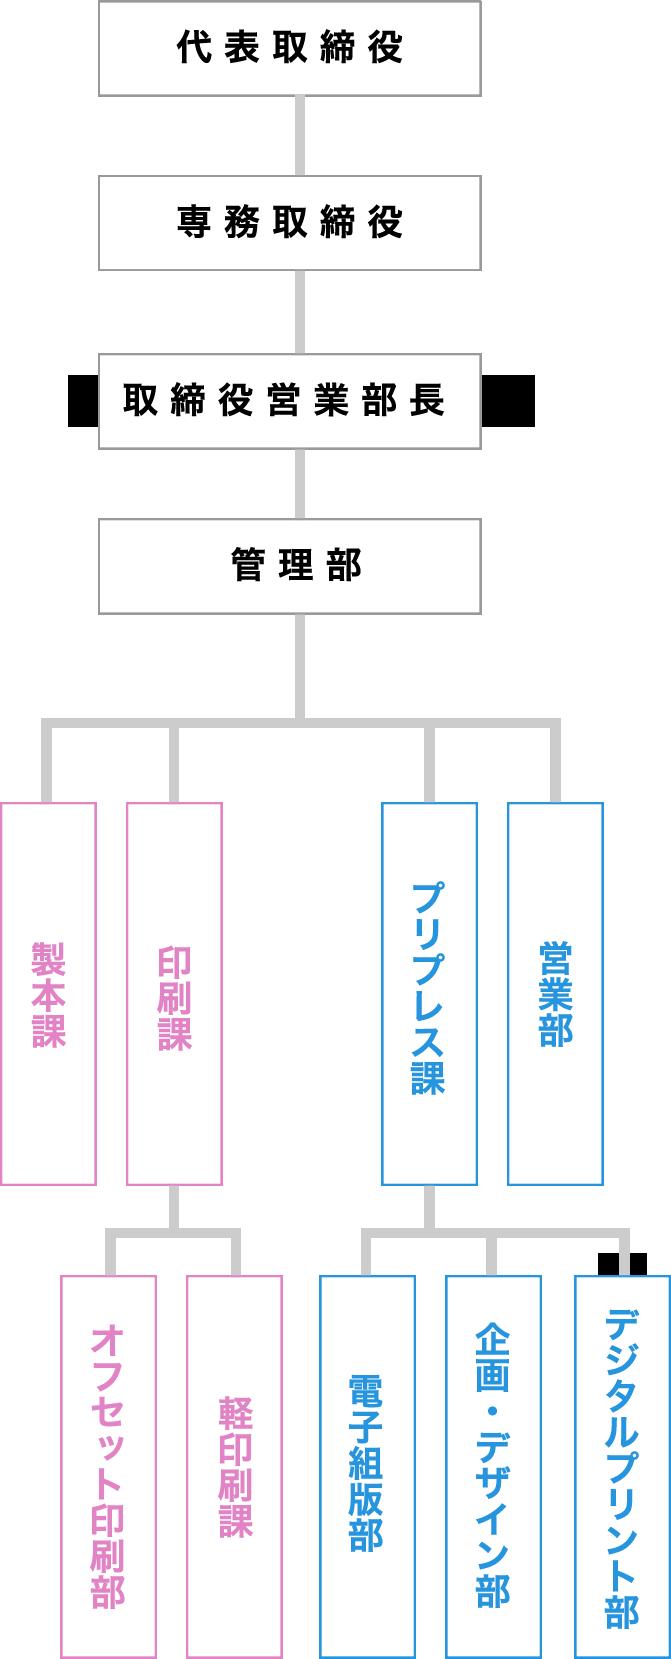 組織図図解